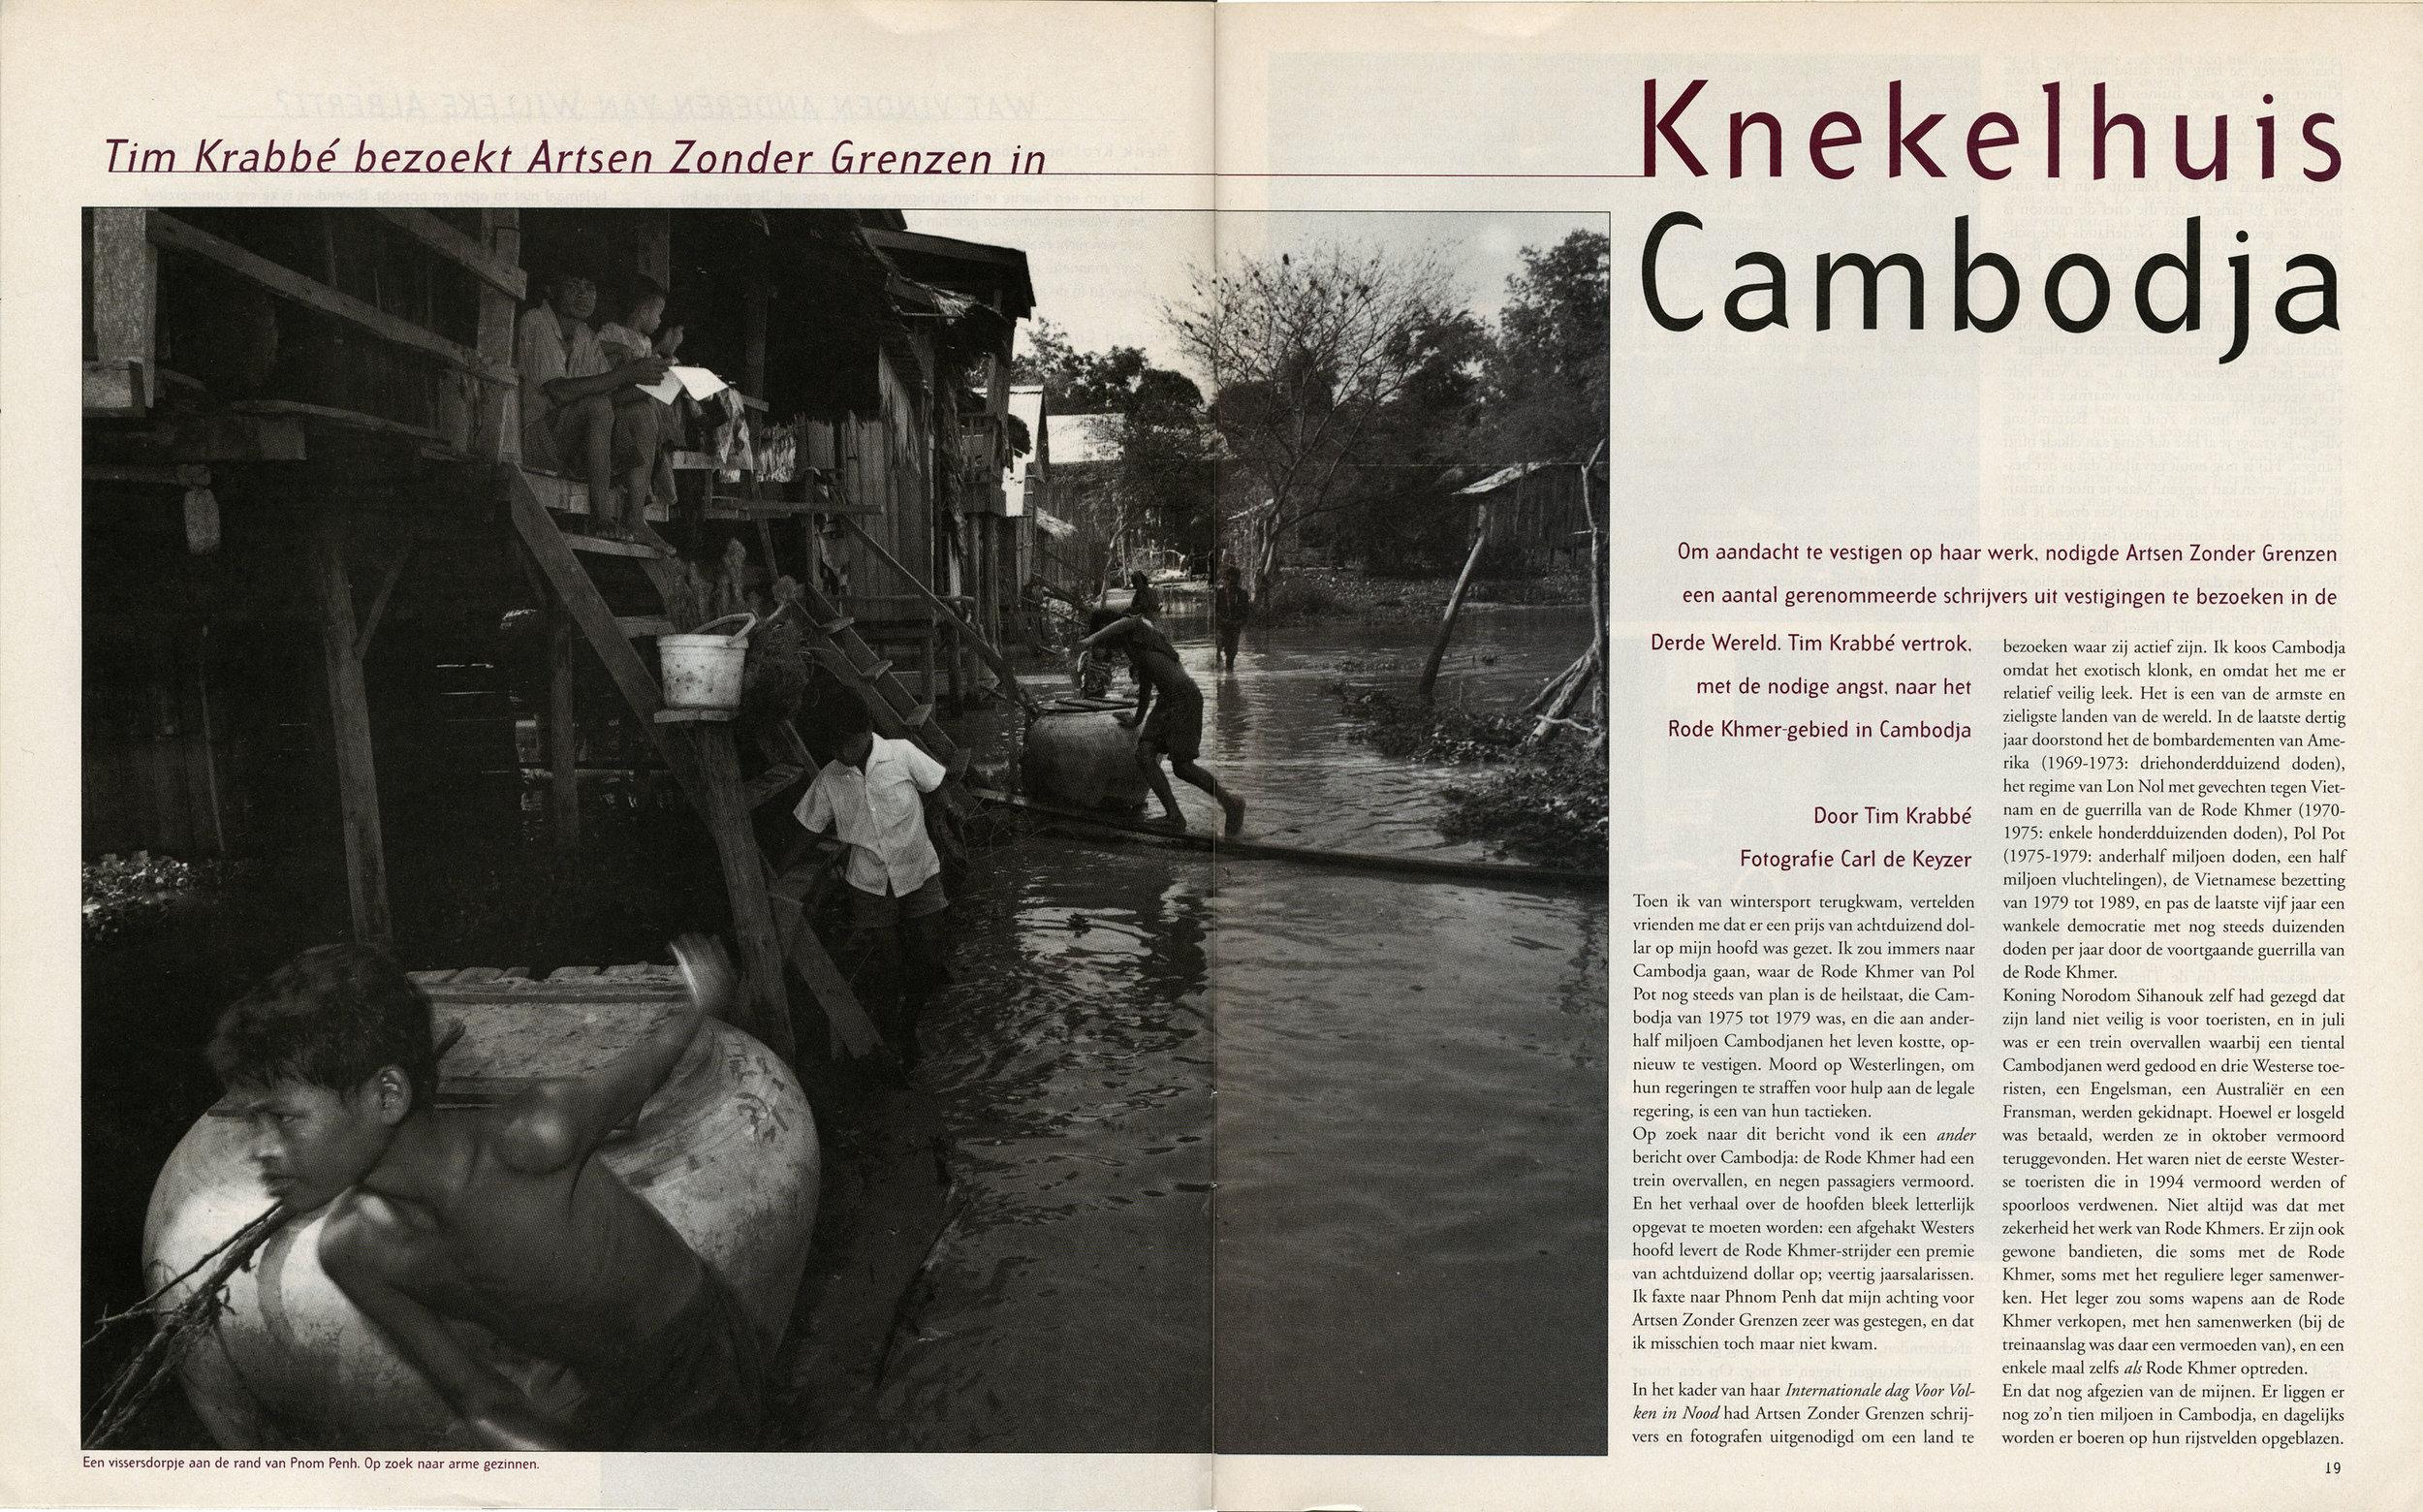 Nieuwe Revu (Cambodia)